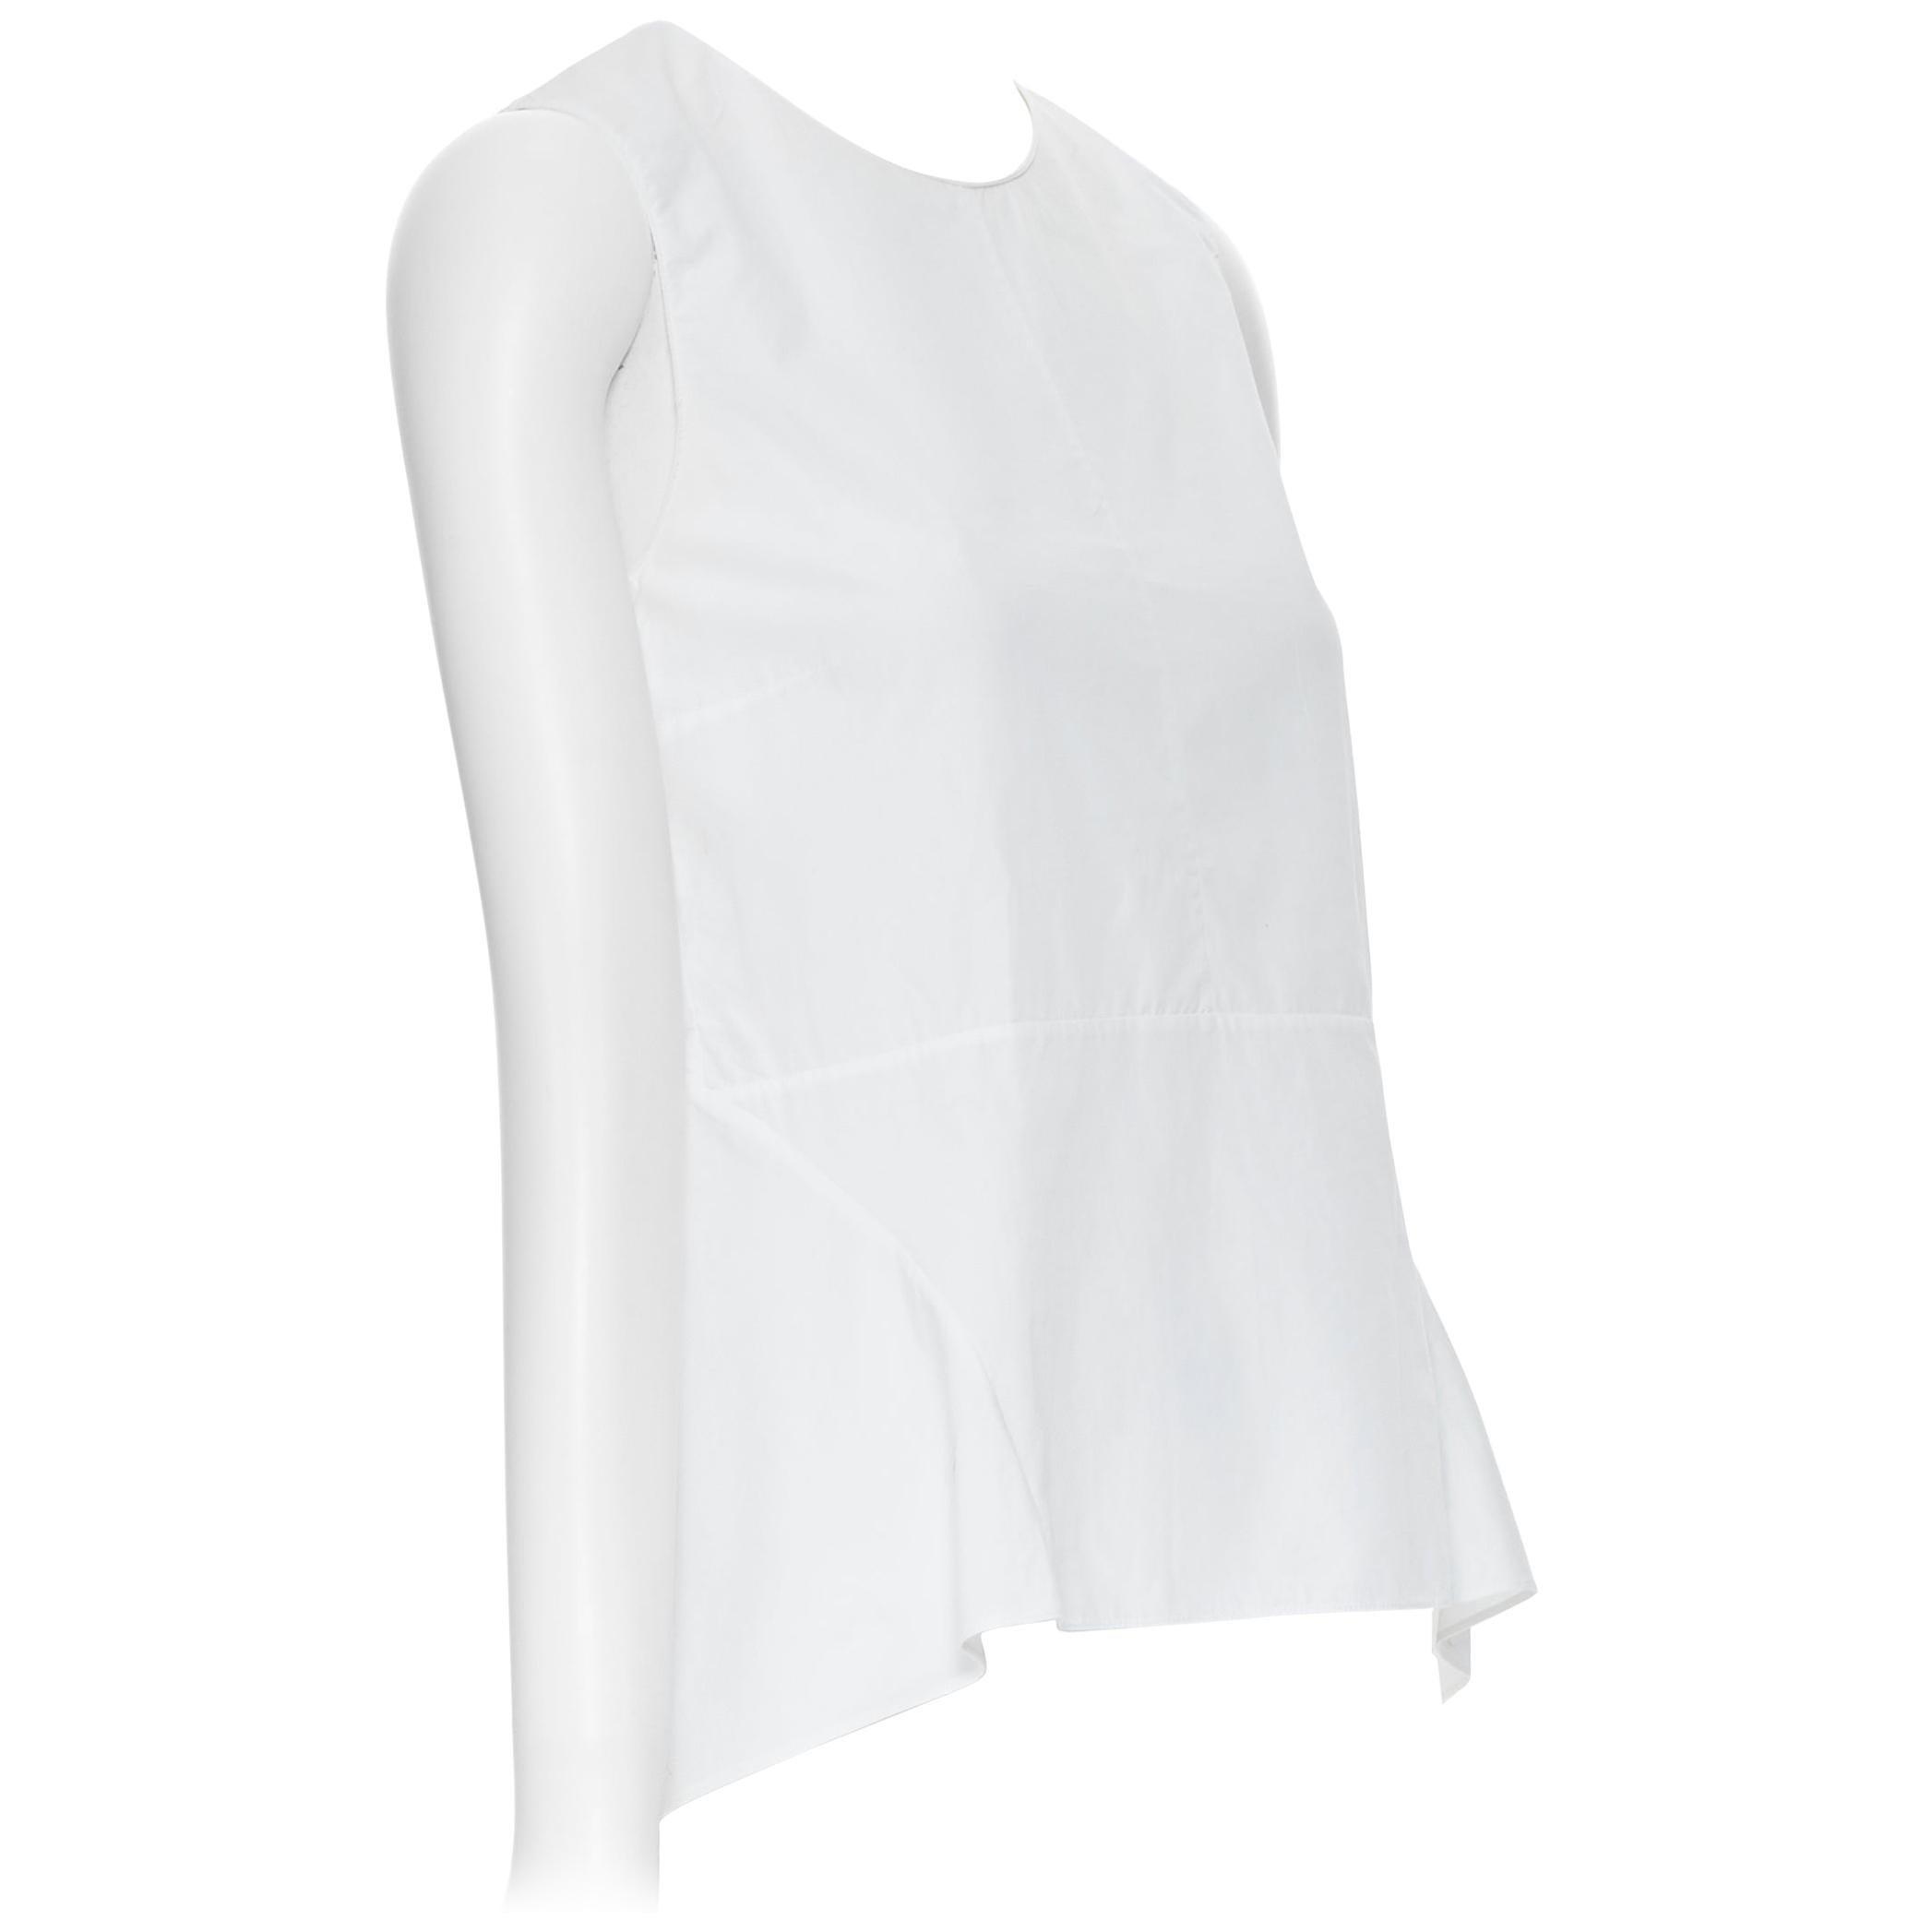 MARNI 100% cotton white curved seam flared hem sleeveless top IT38 XS